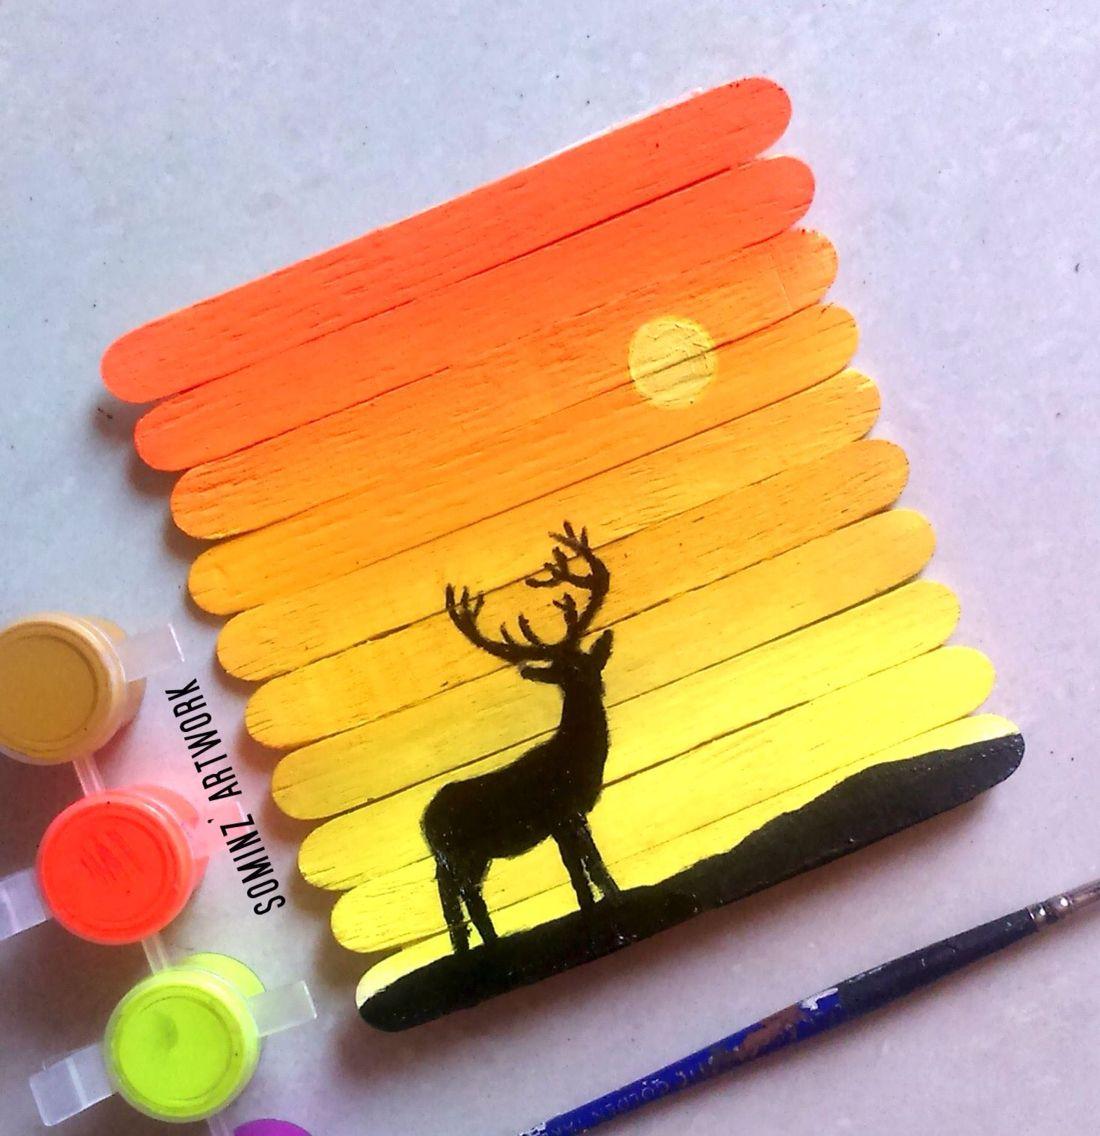 Painting On Icecream Sticks Popsicle Art Popsicle Stick